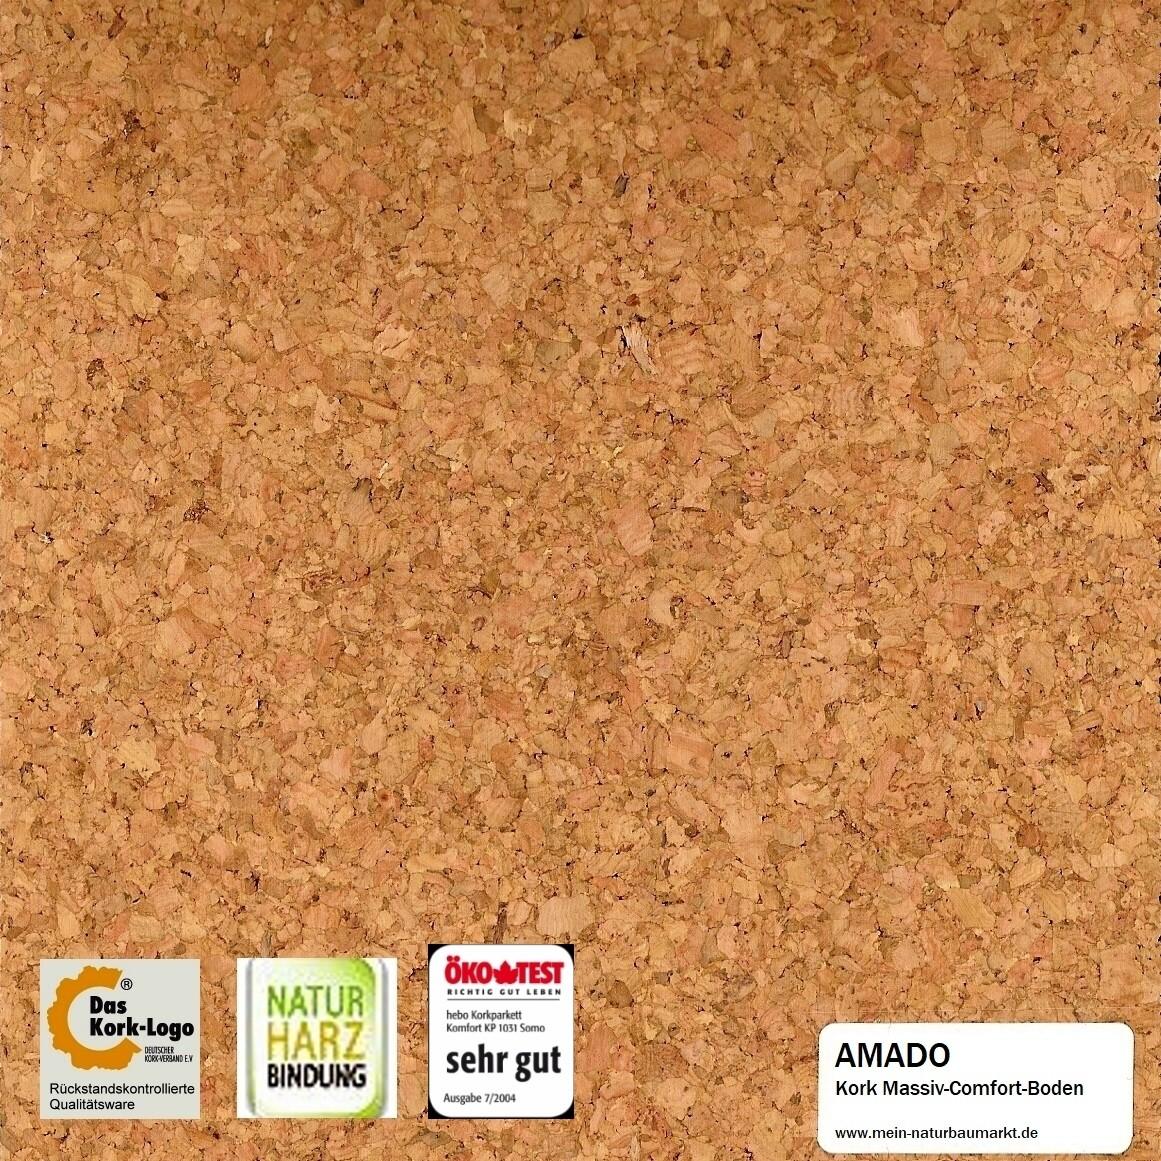 Massiv-Comfort-Boden Kork AMADO